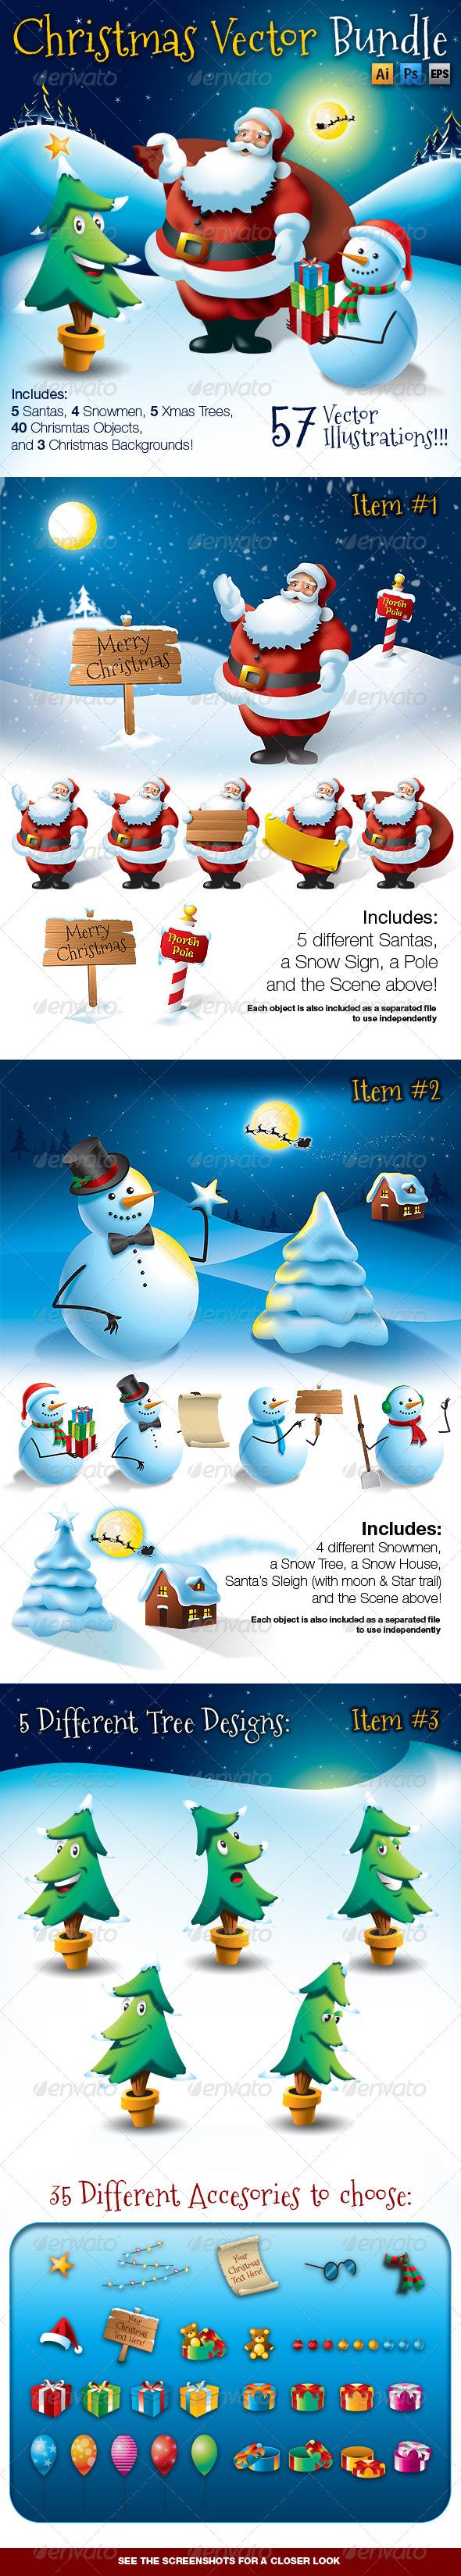 GraphicRiver Christmas Vector Bundle 6330638